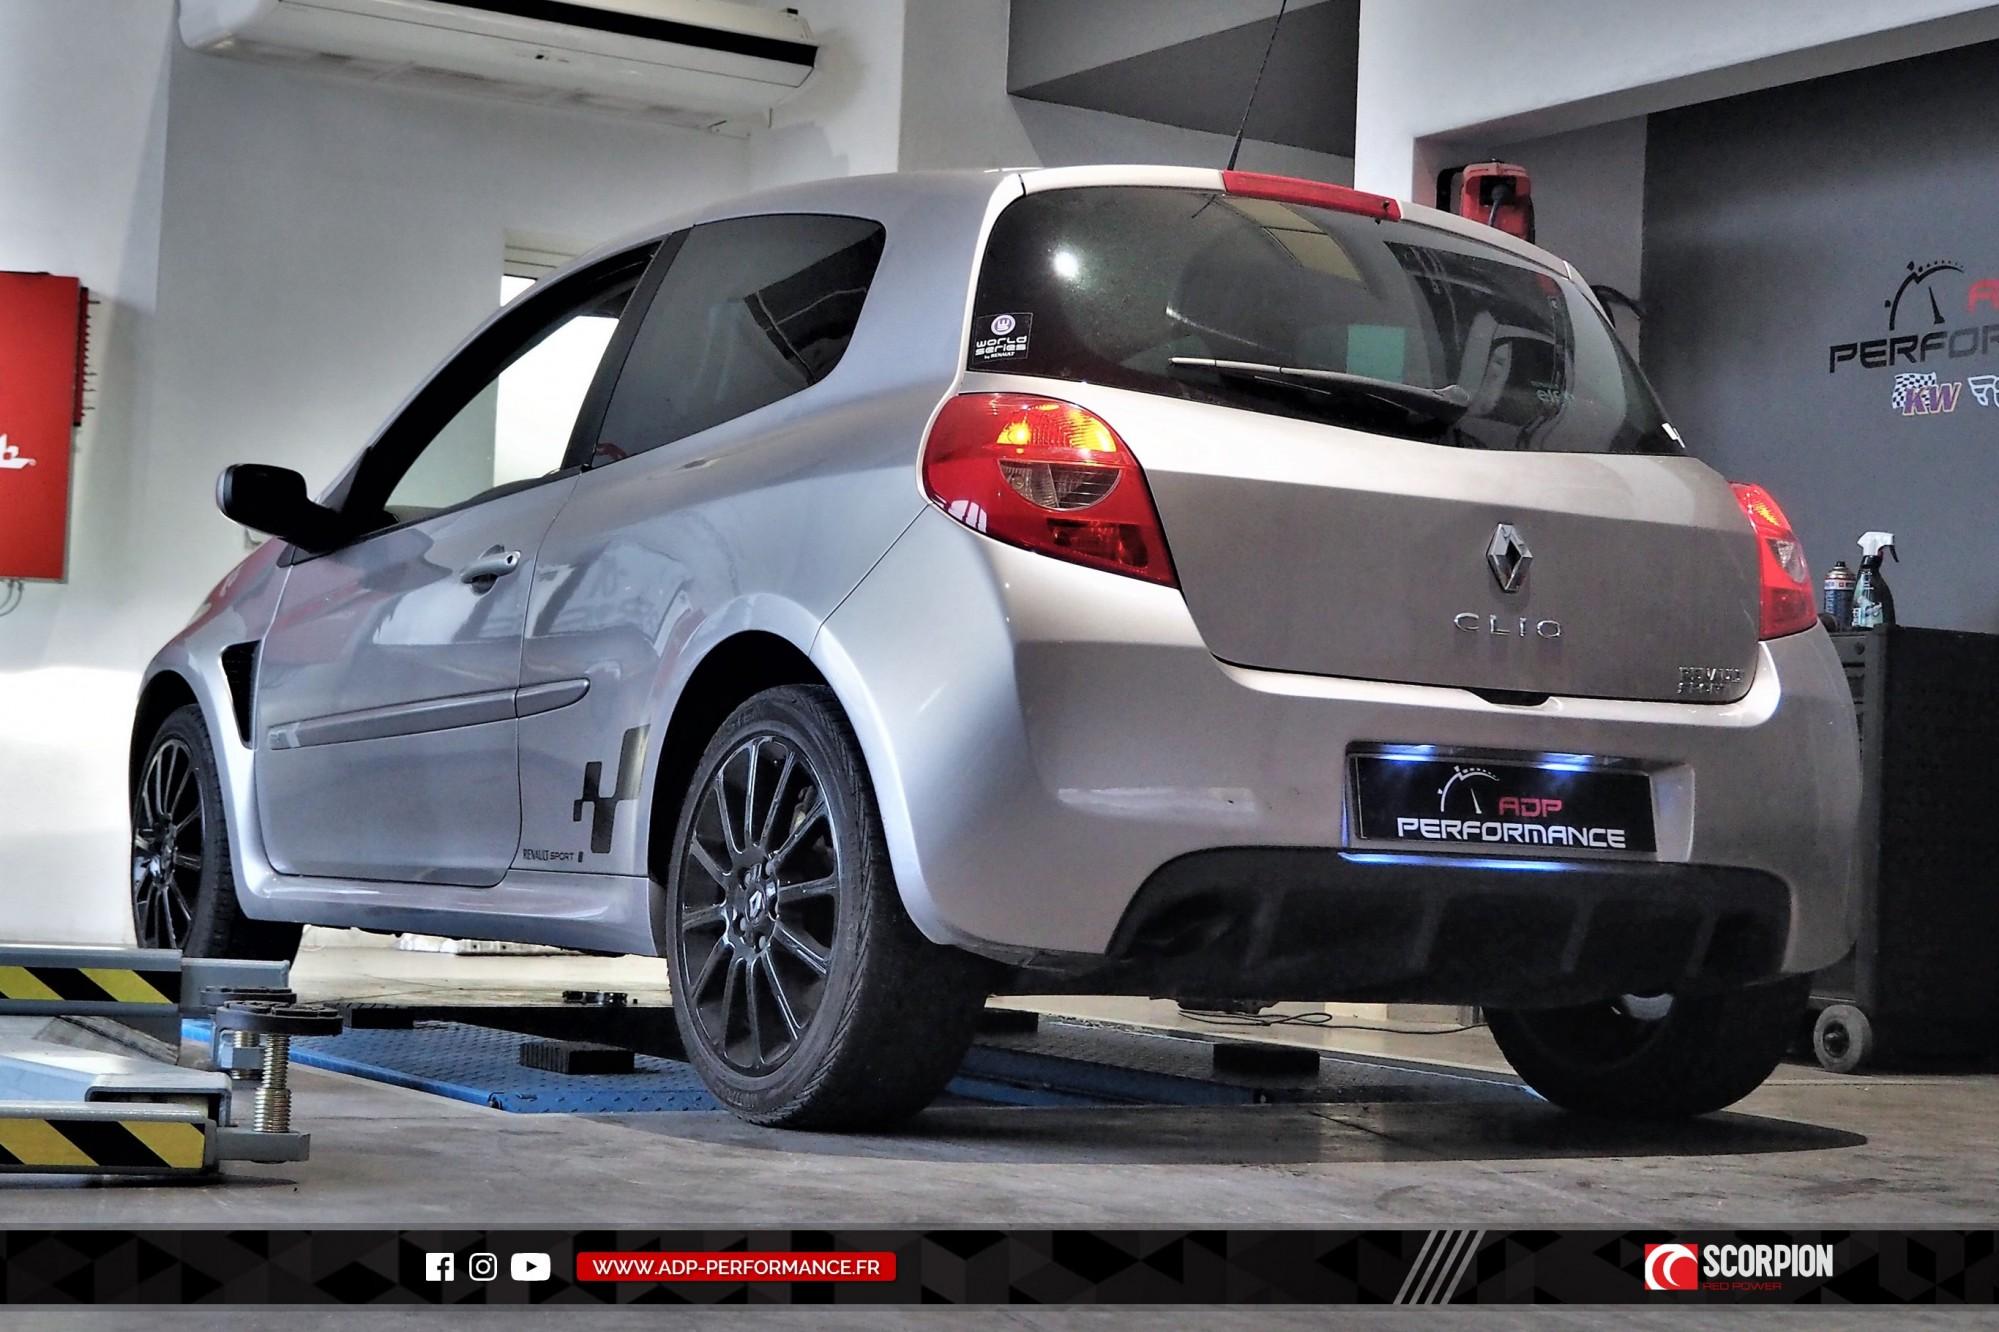 Catback Scorpion Plan de Campagne - Renault Clio 3 RS - ADP Performance